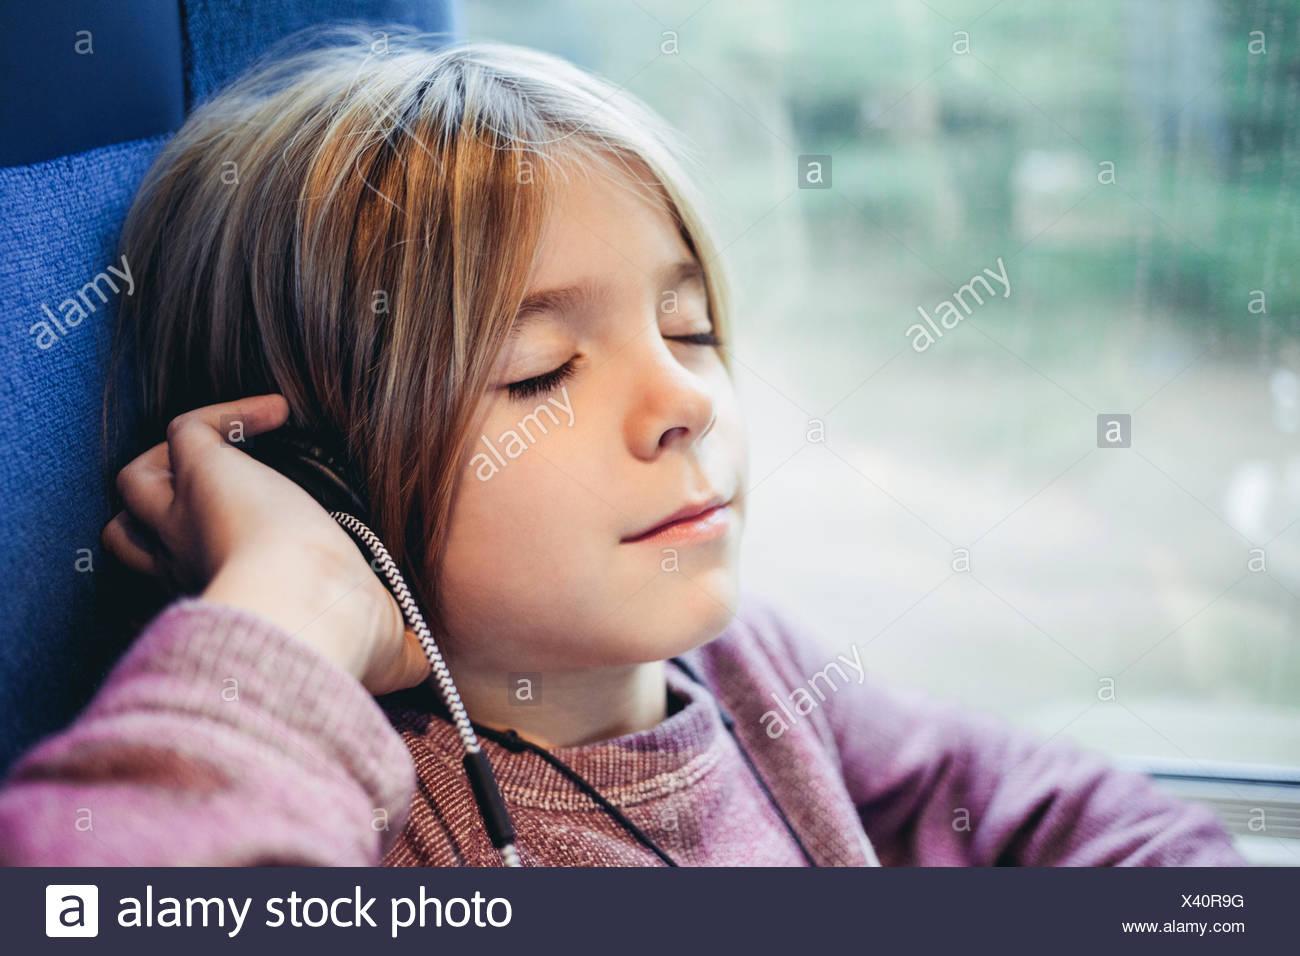 Chico escuchando música Imagen De Stock